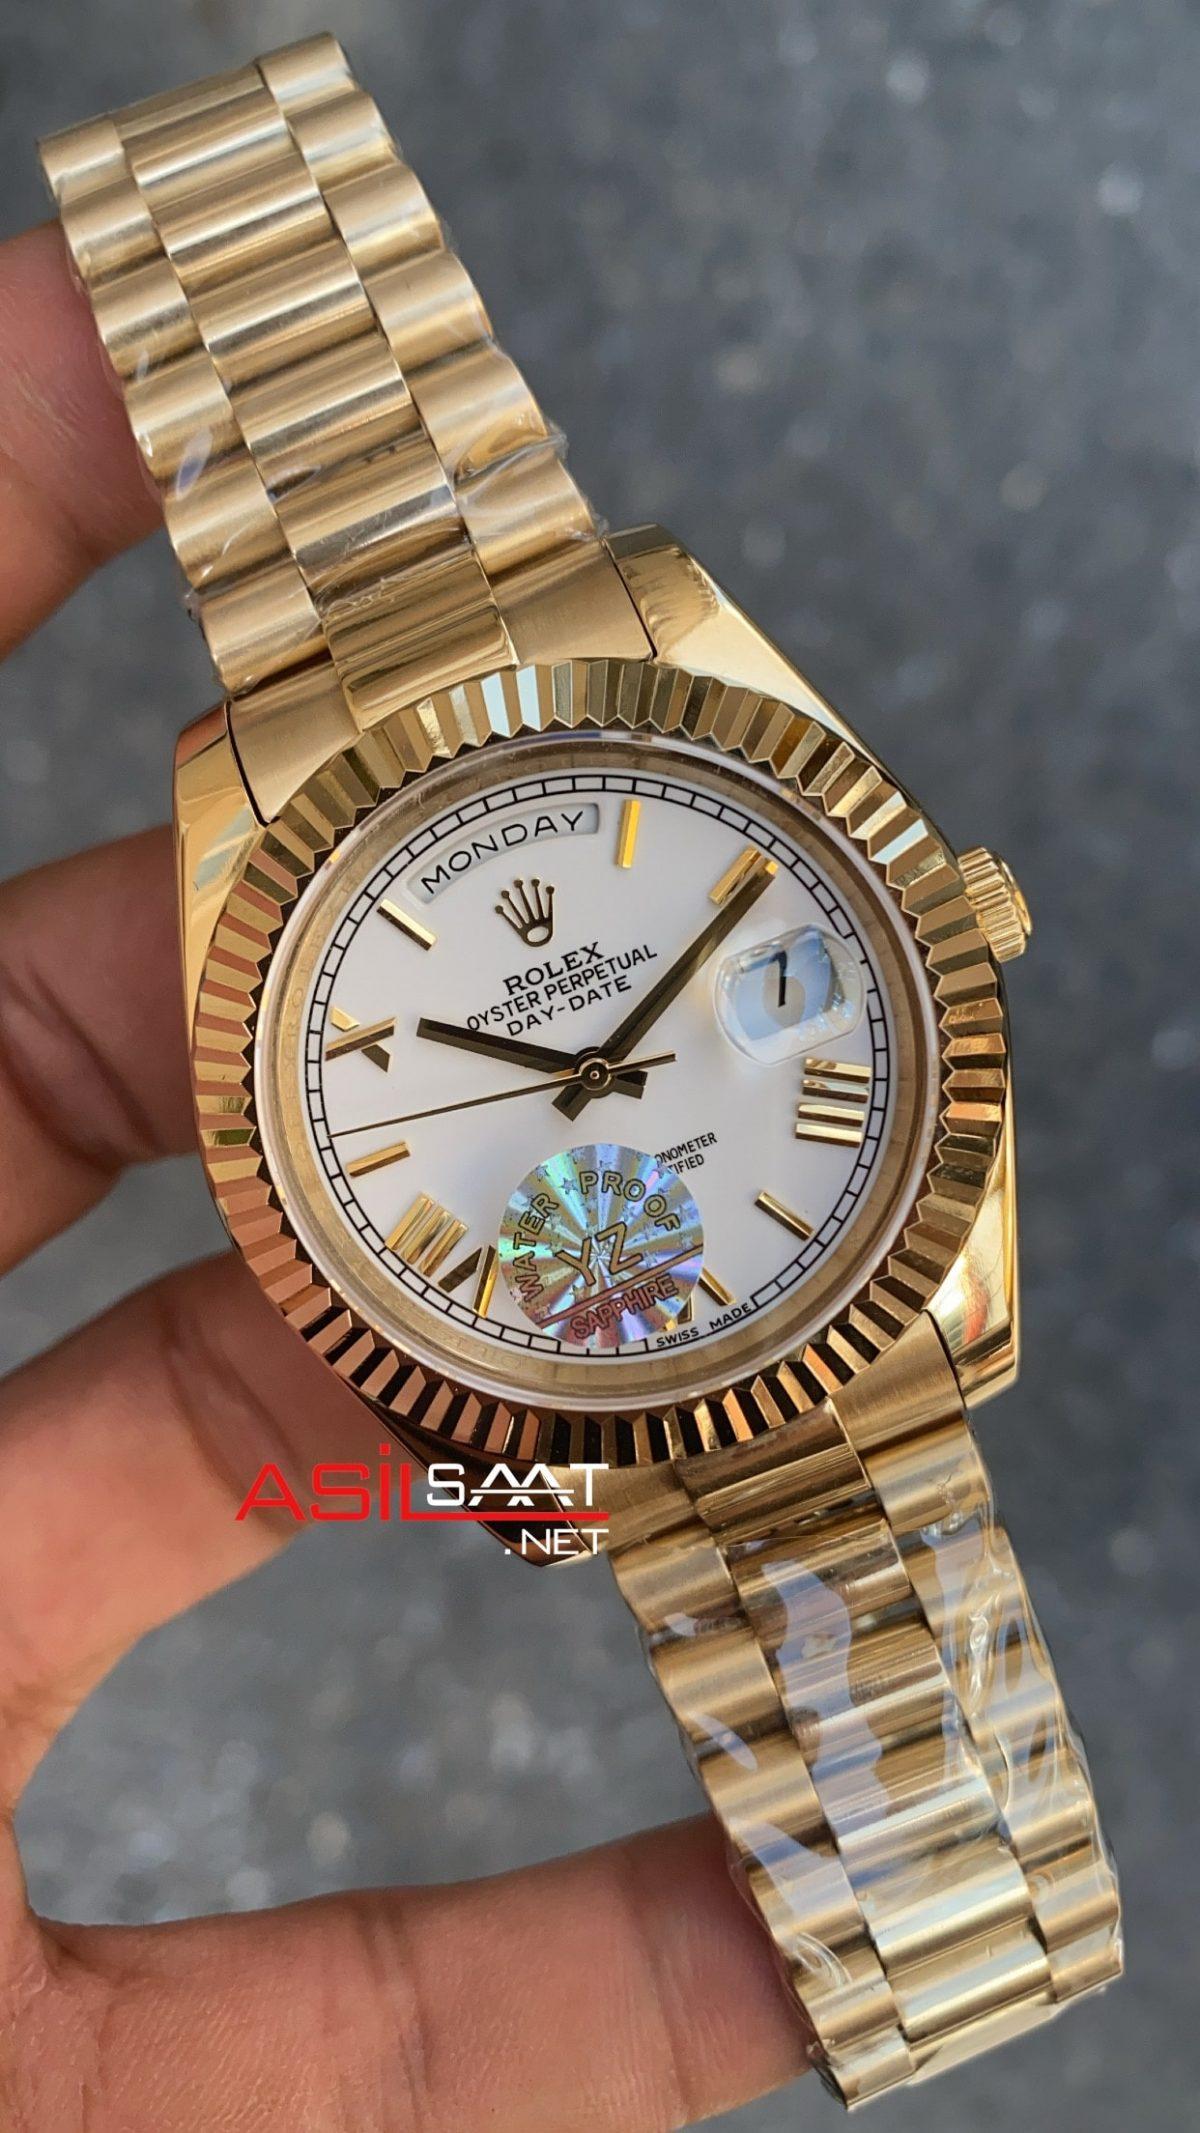 Rolex Day Date 228238 White Romen Dial ROLDD022